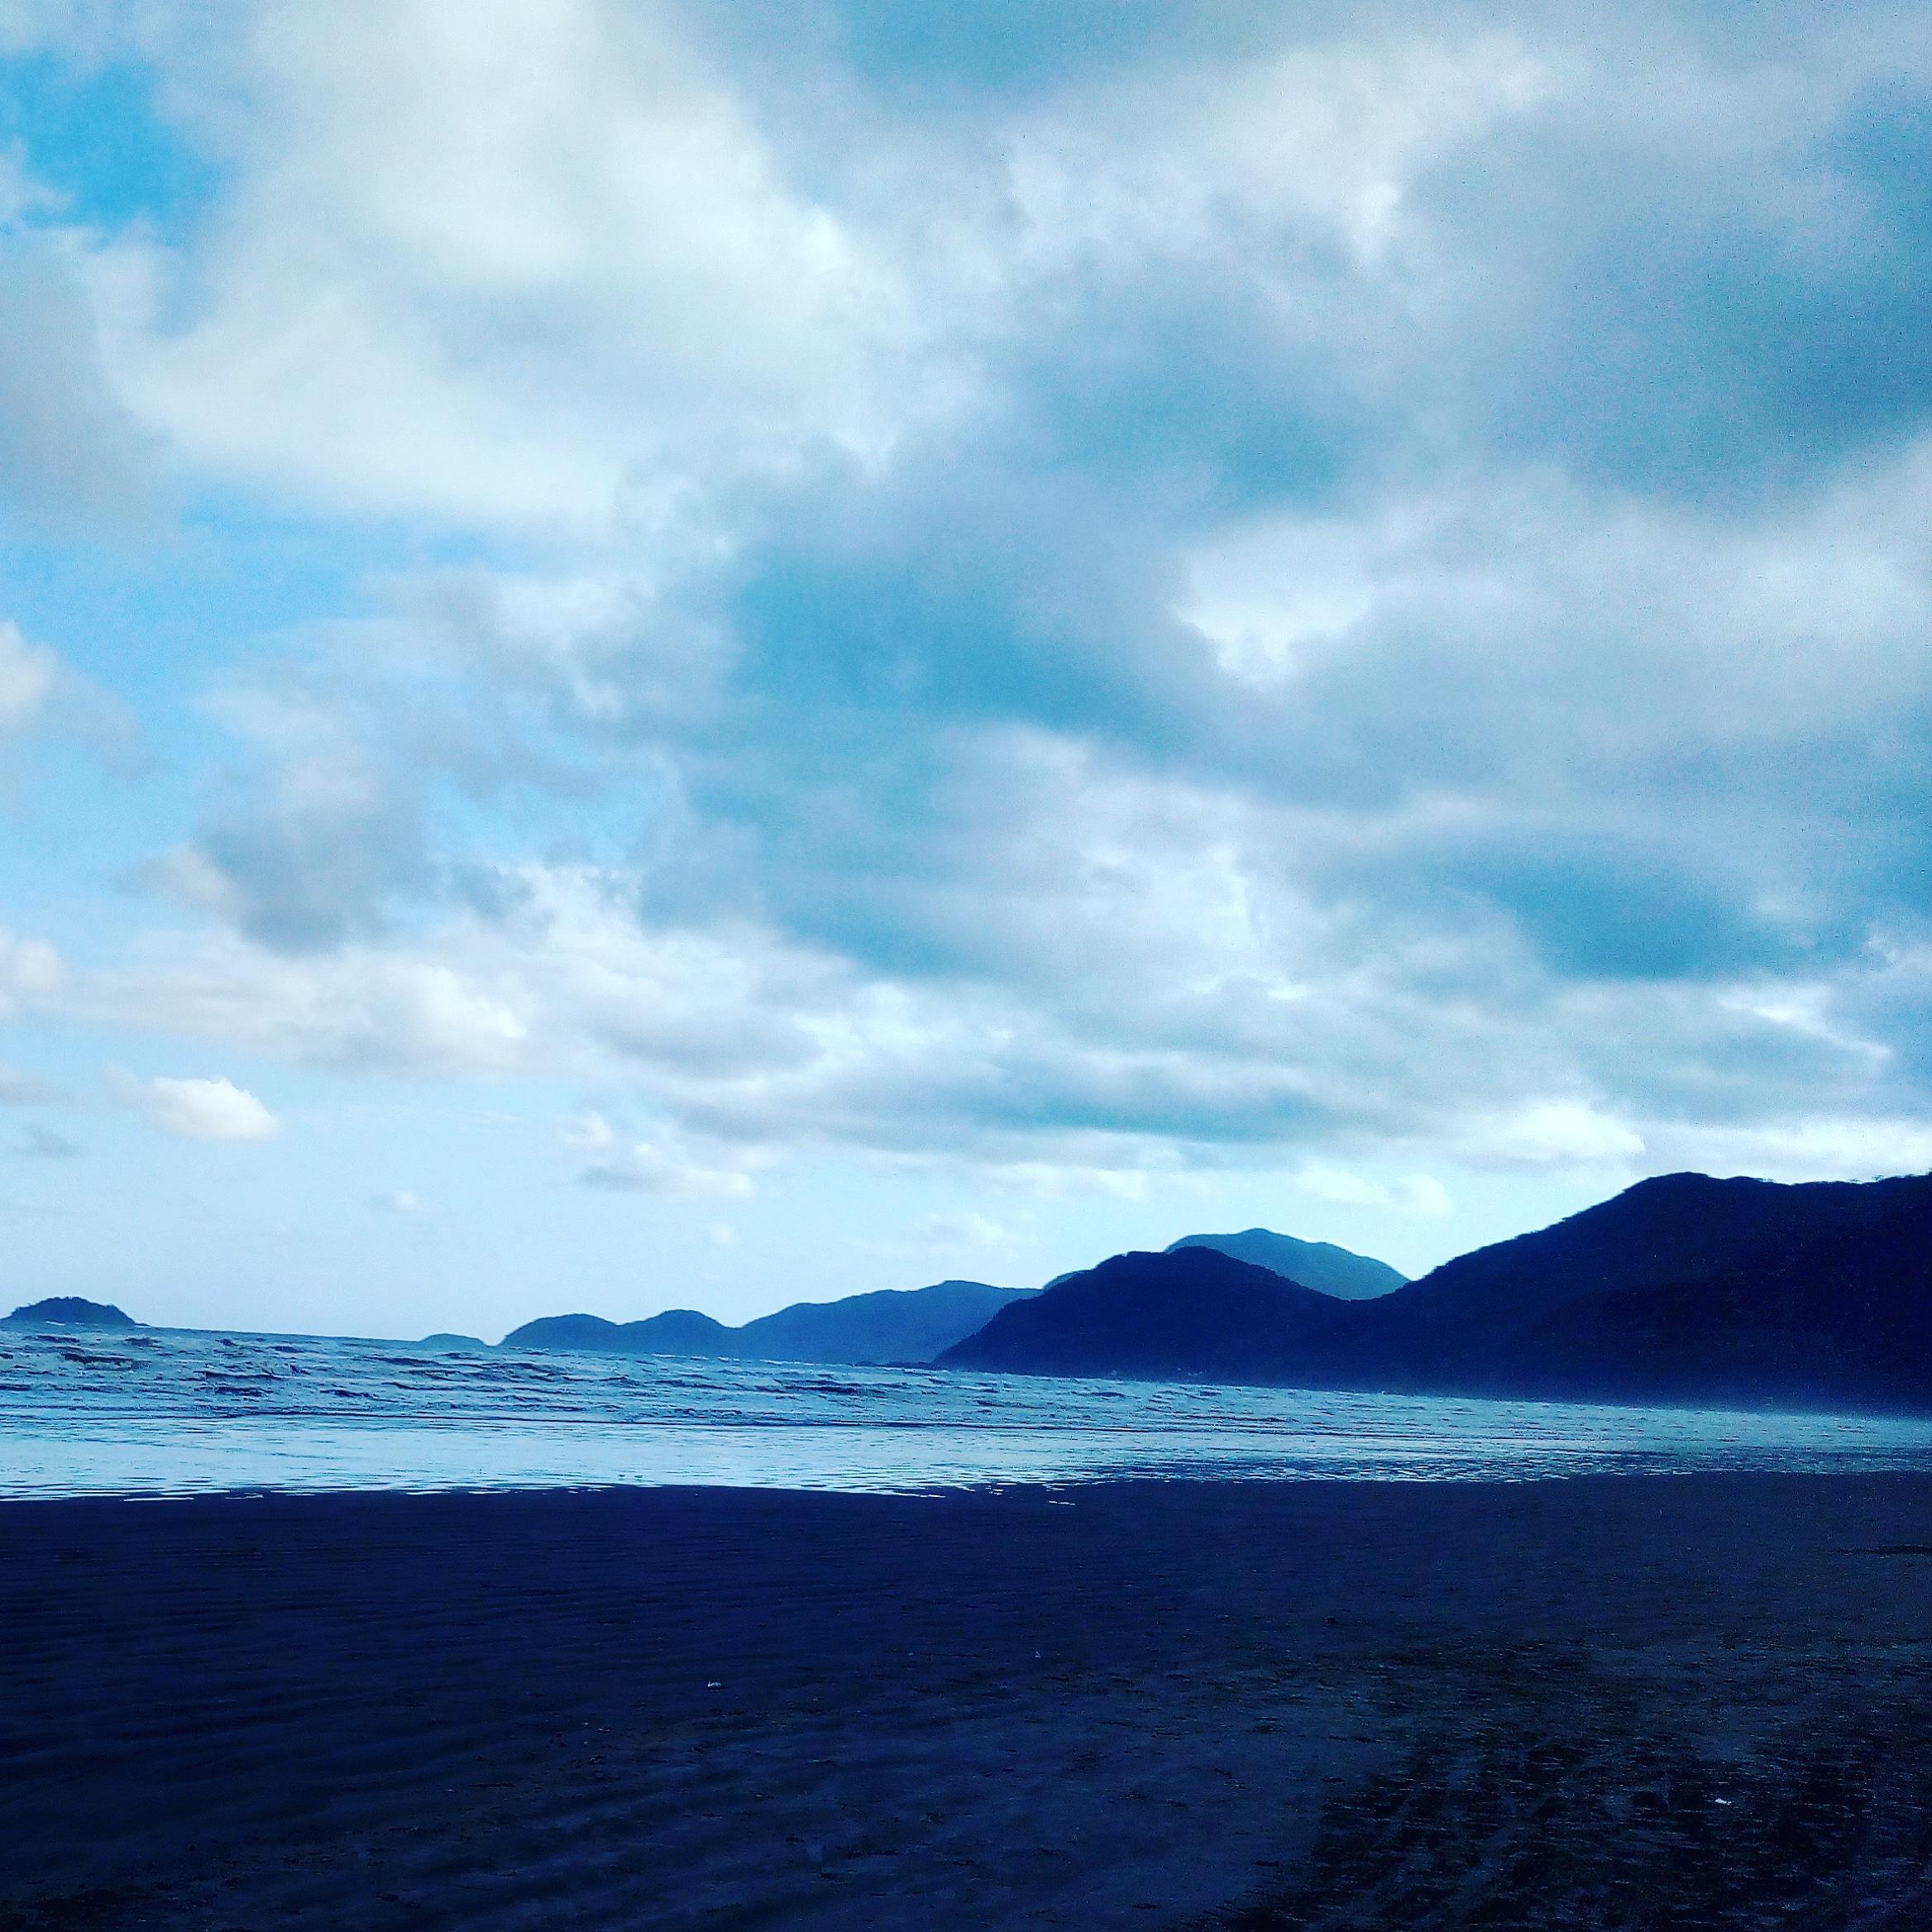 Praia da Orla